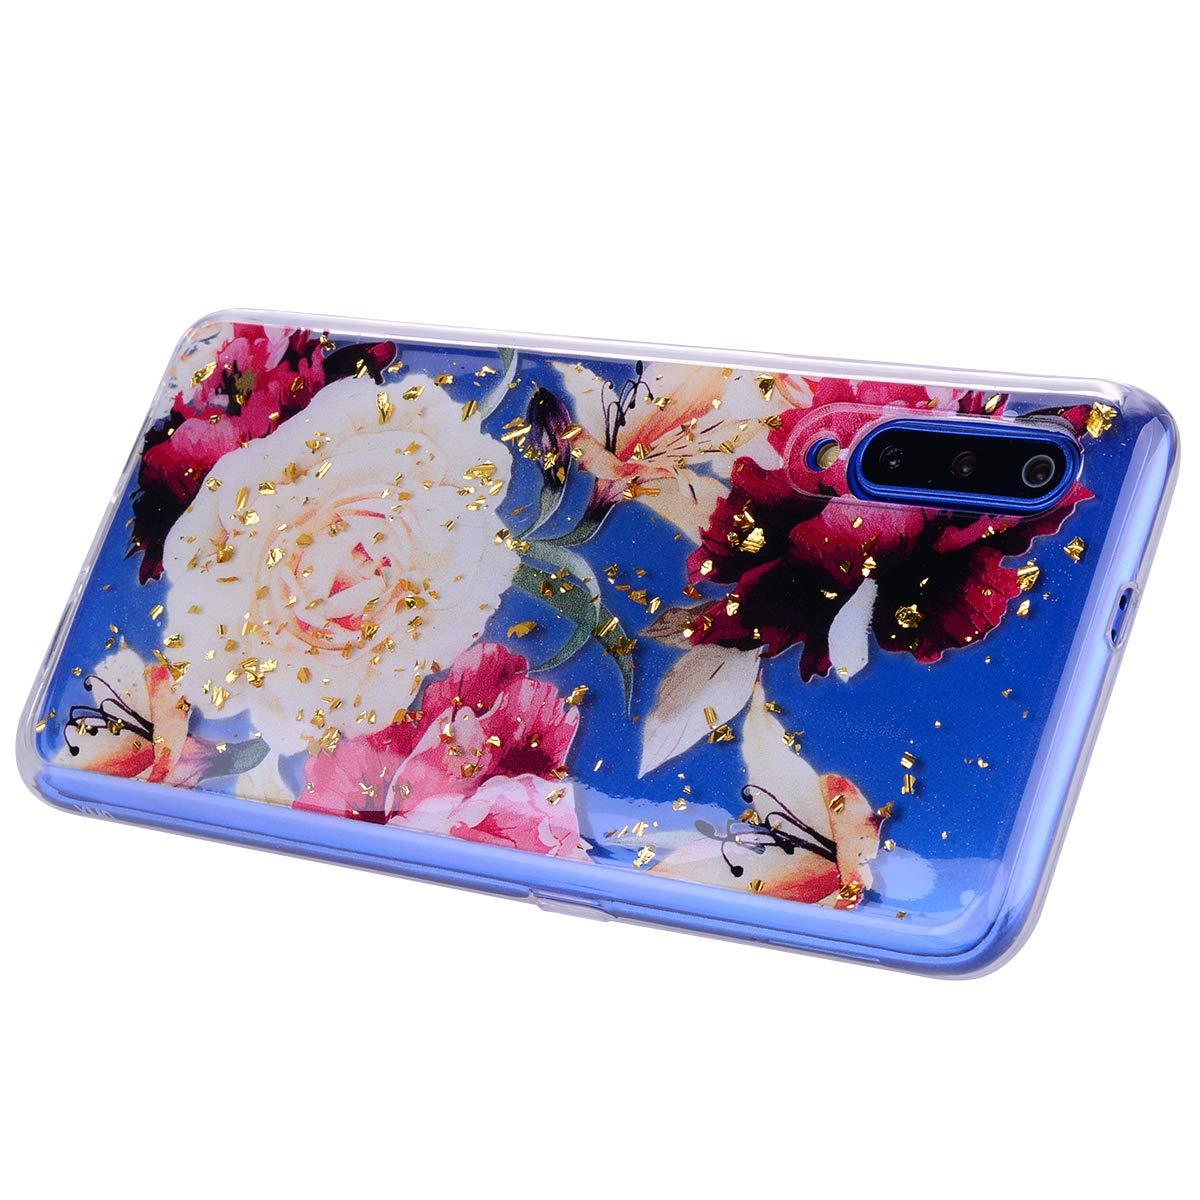 Funda para Samsung A50 Silicona Transparente TPU Flexible Ultra Fina CoverTpu Funda para Samsung A50 Carcasa para Samsung A50 Anti-Rasgu/ño Protectora Case Mariposa Azul